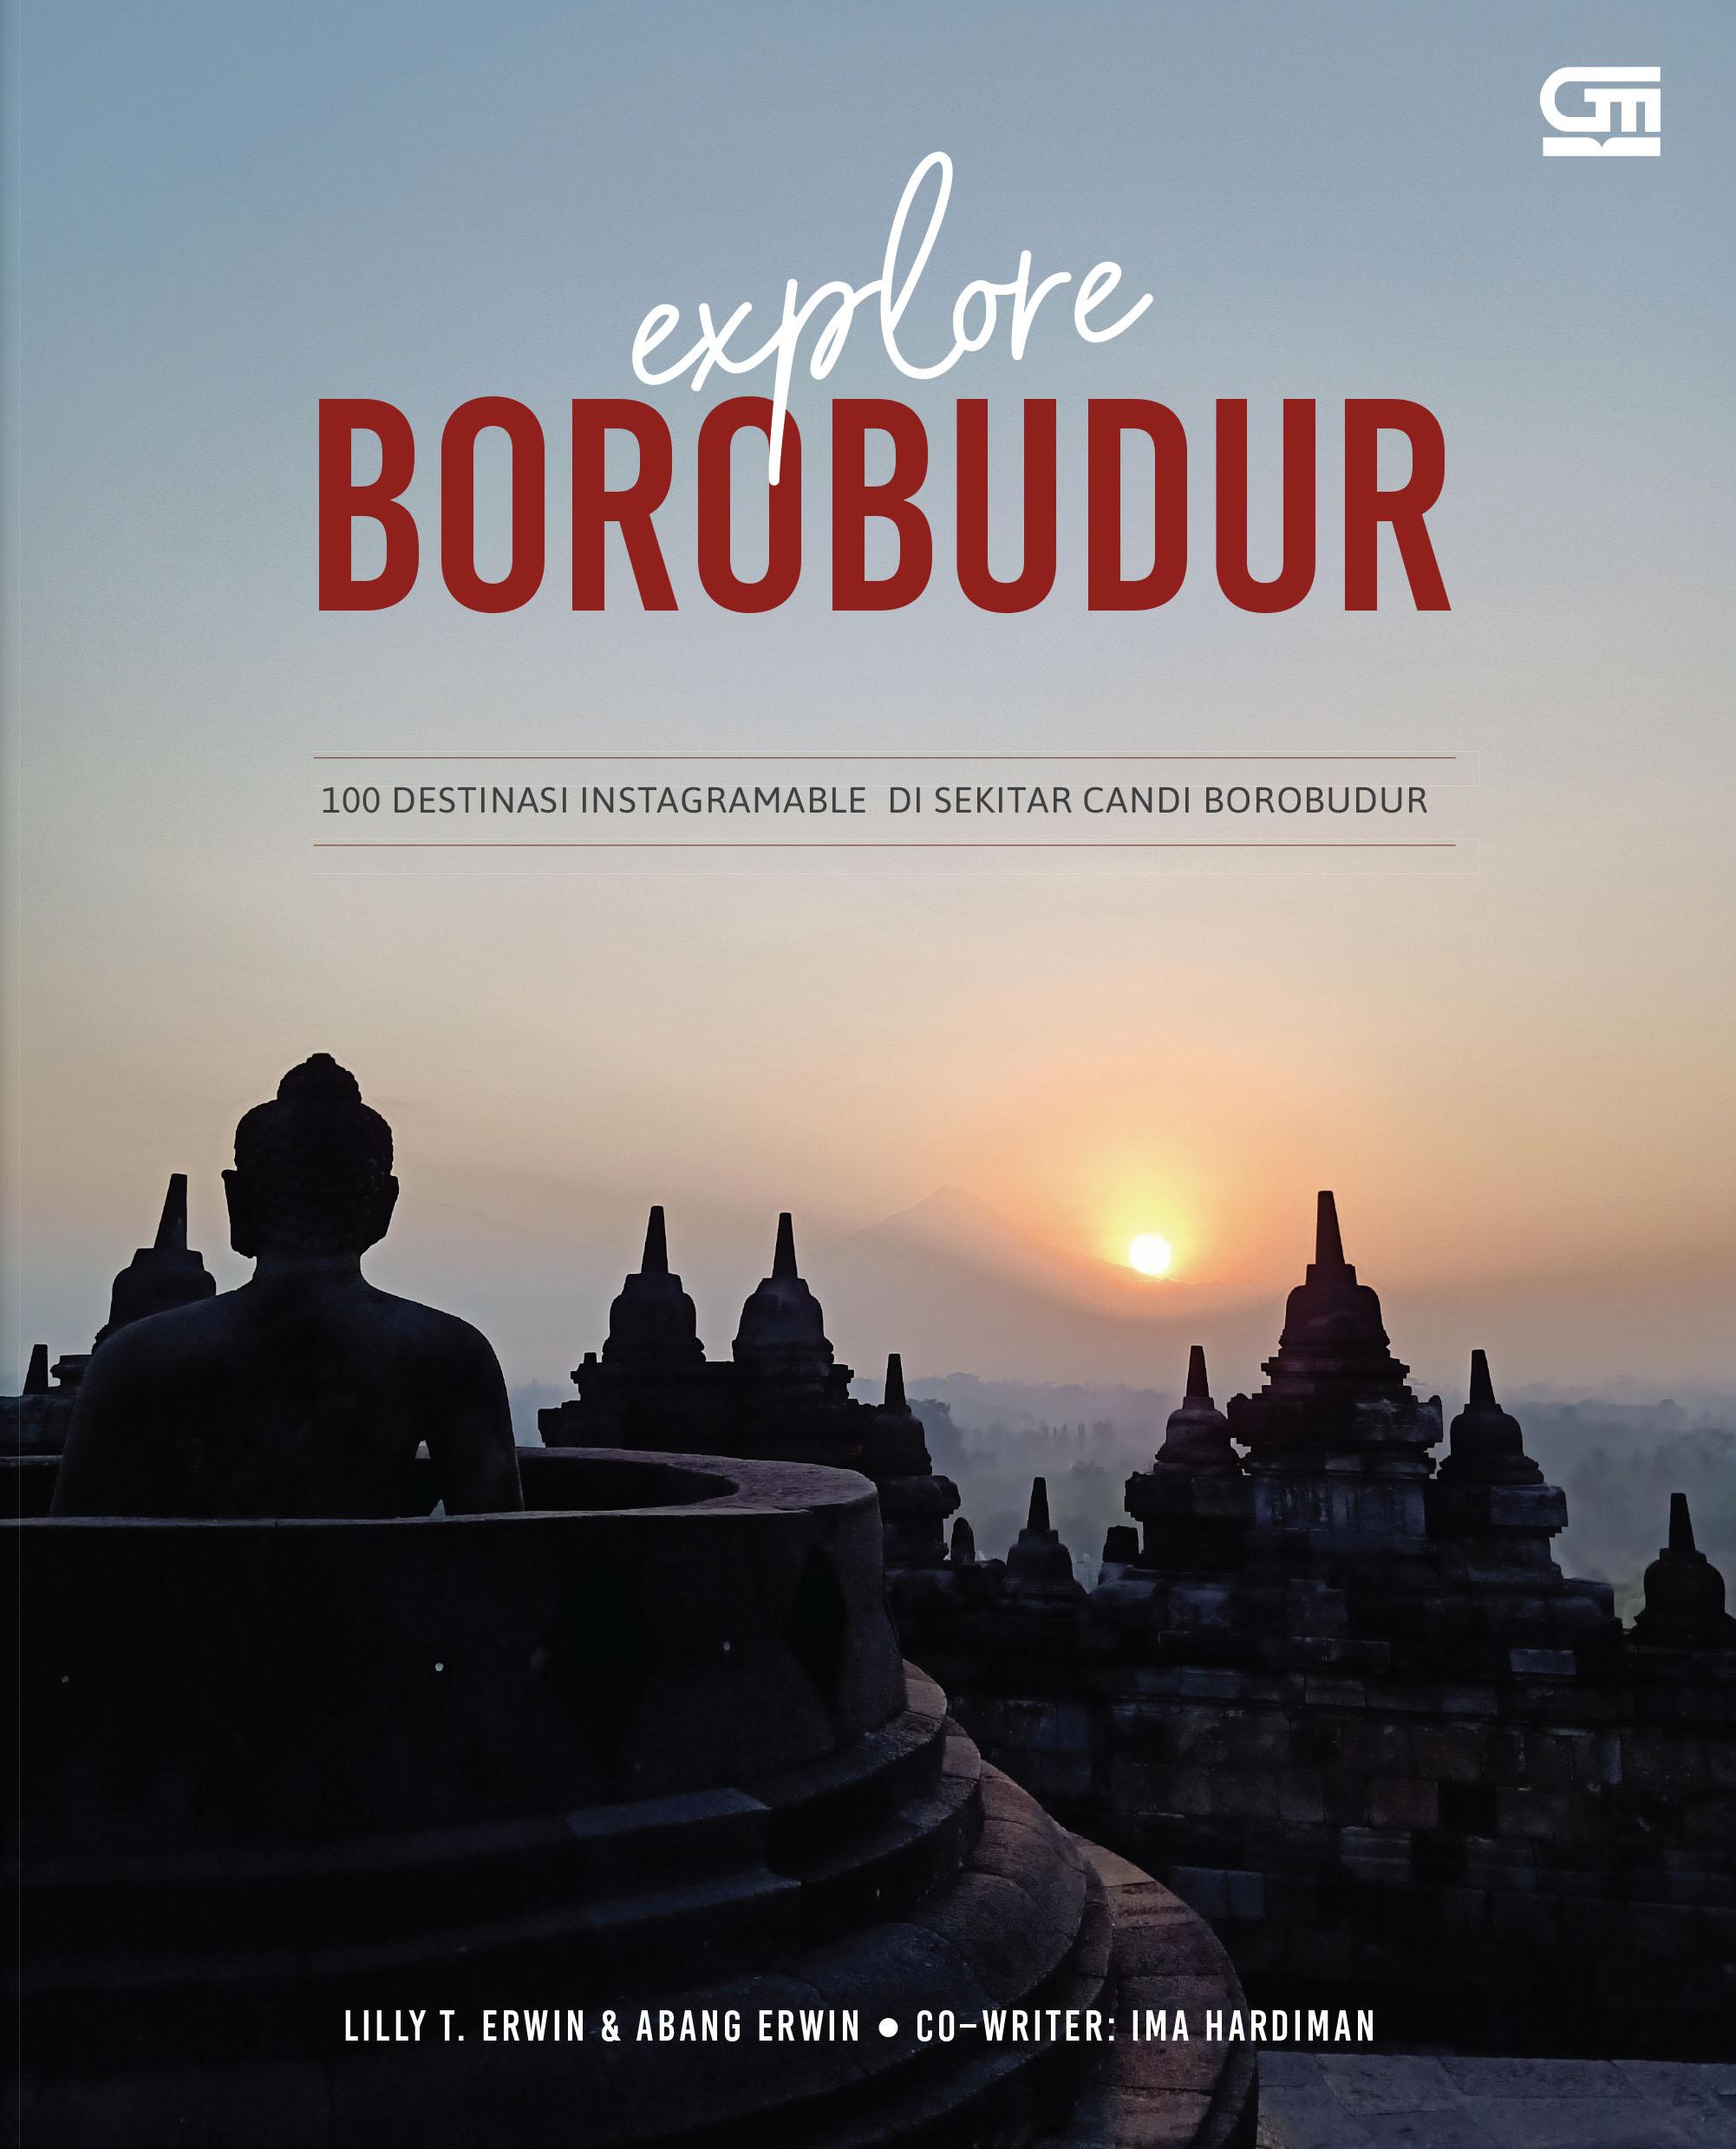 Explore Borobudur: 100 Destinasi Instagramable di Sekitar Candi Borobudur